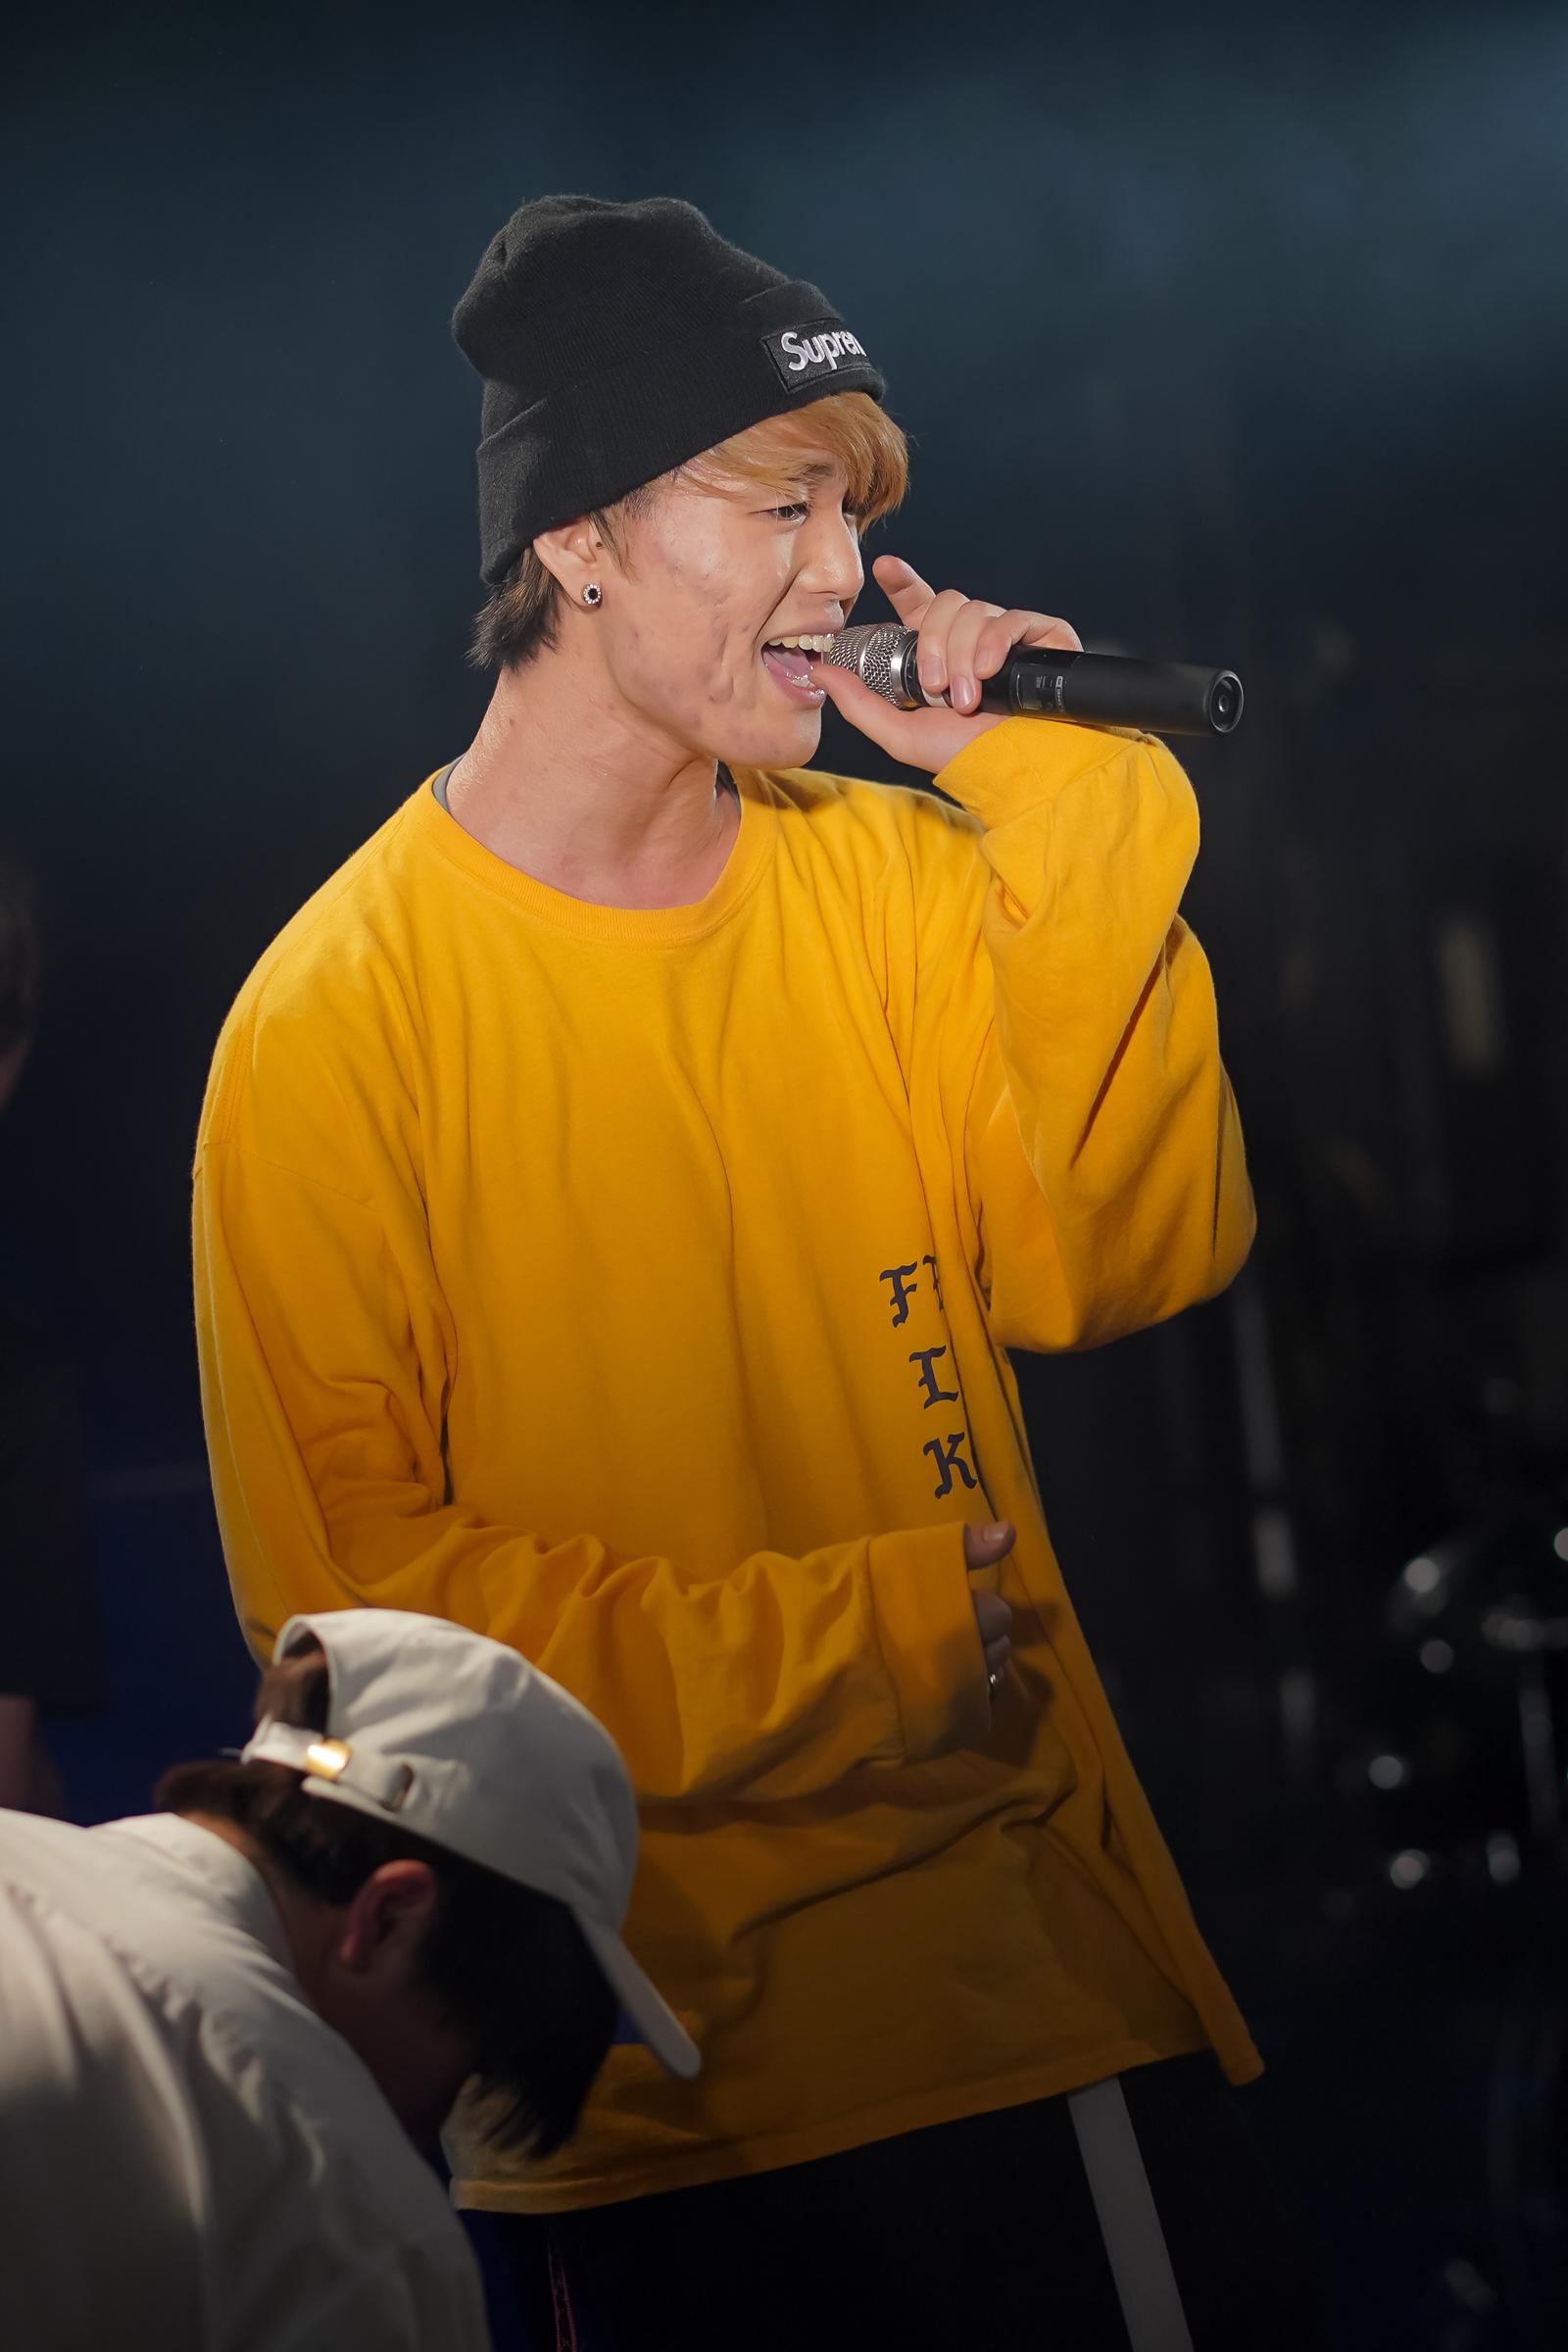 G.E.E.K HAYATO★ | ユニバーサル・ライブプロ・ジャパン2018